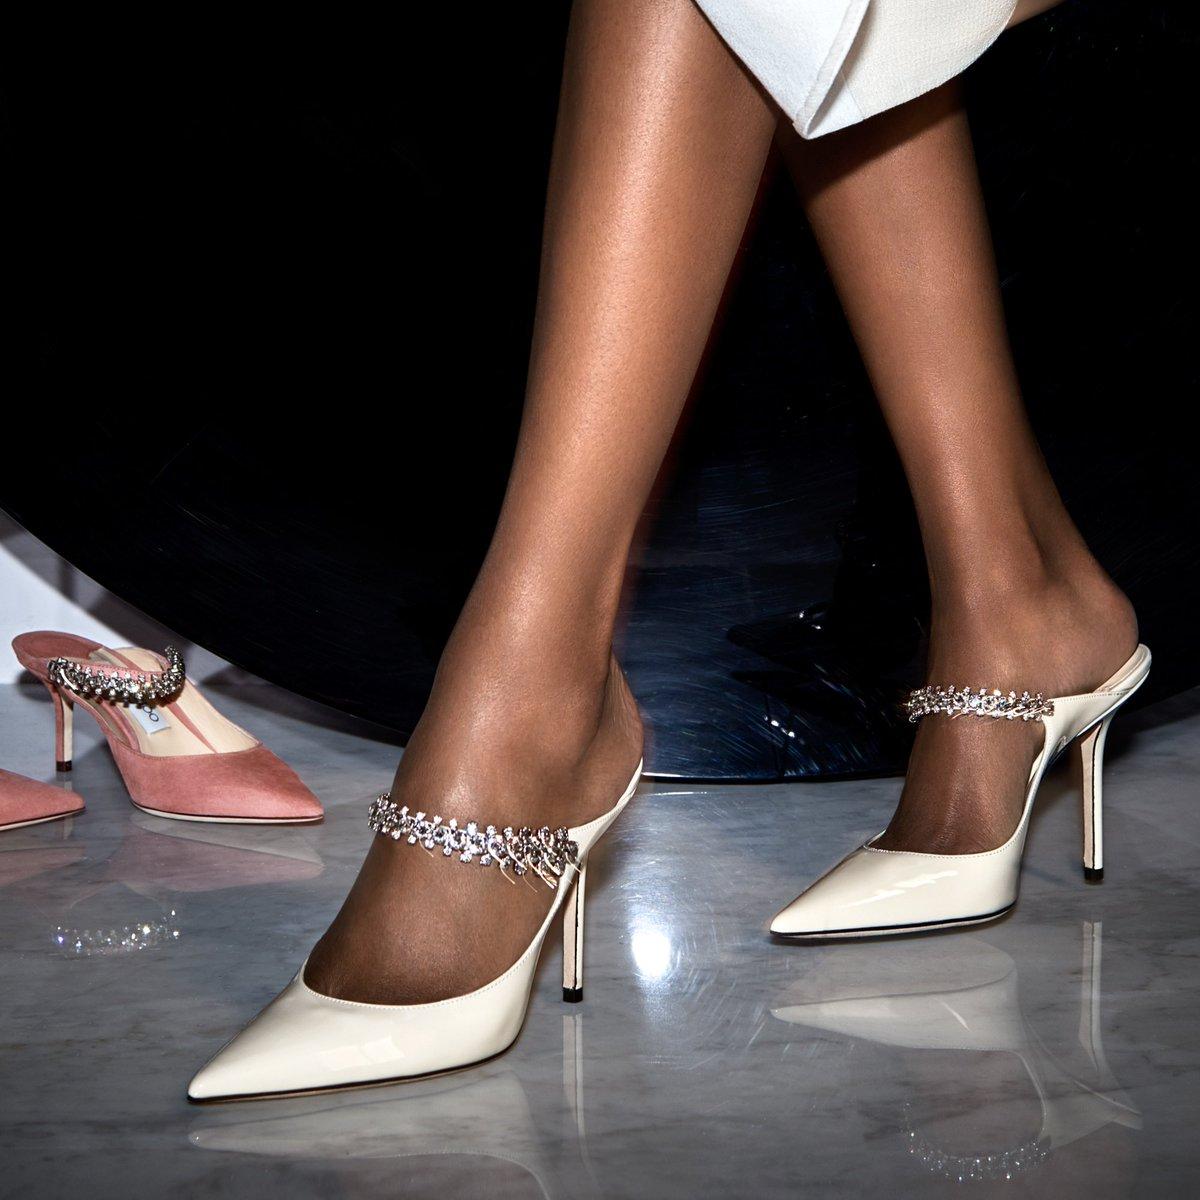 18b09d8cdcbb The 65mm heel is engineered to work all day and dance all night.  http   bit.ly CR19 BING pic.twitter.com X8BJjIxbq6